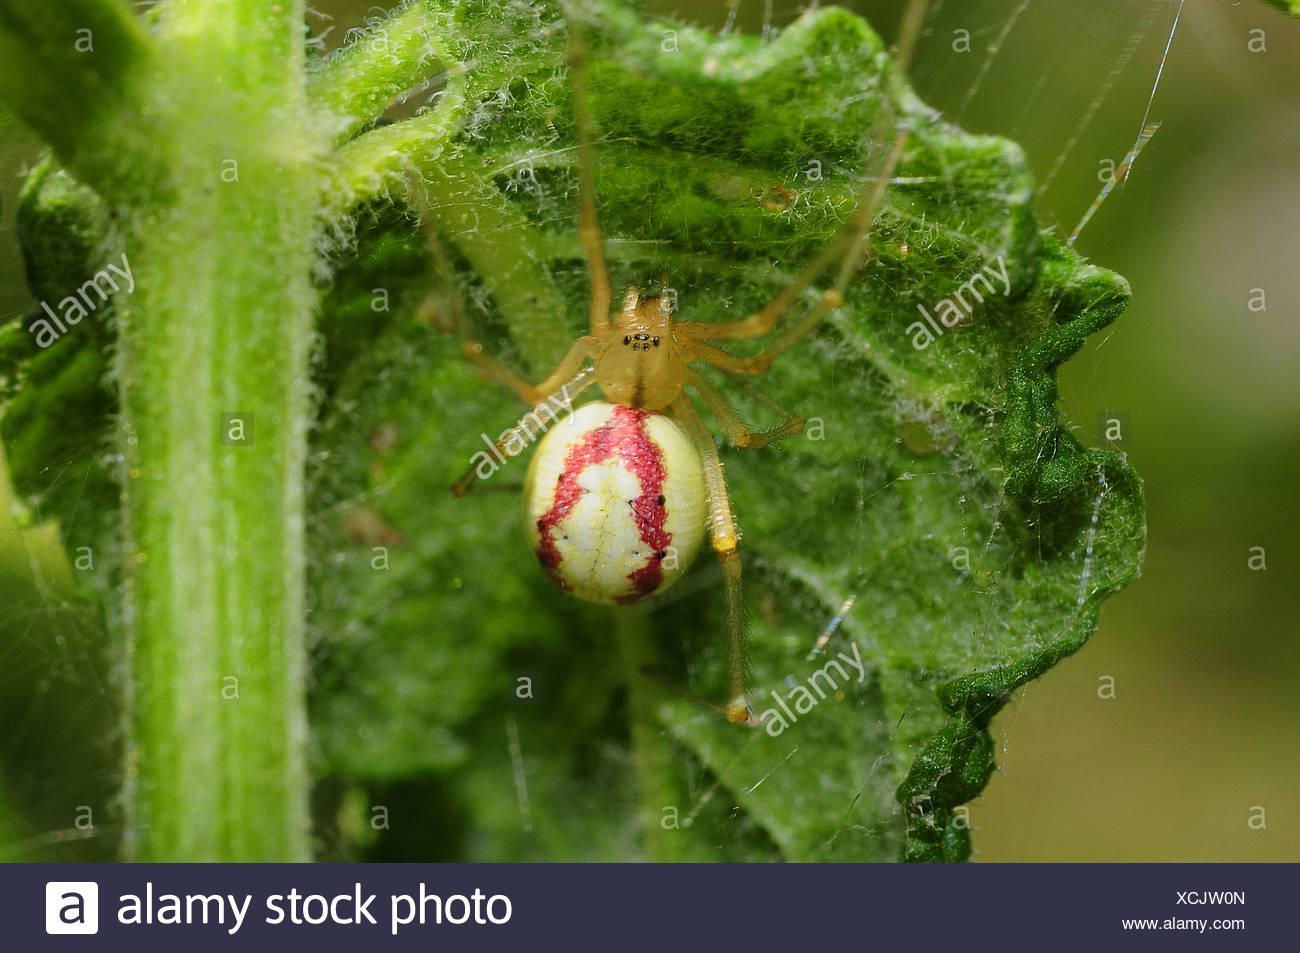 Spider, Enoplognatha ovata - Stock Image